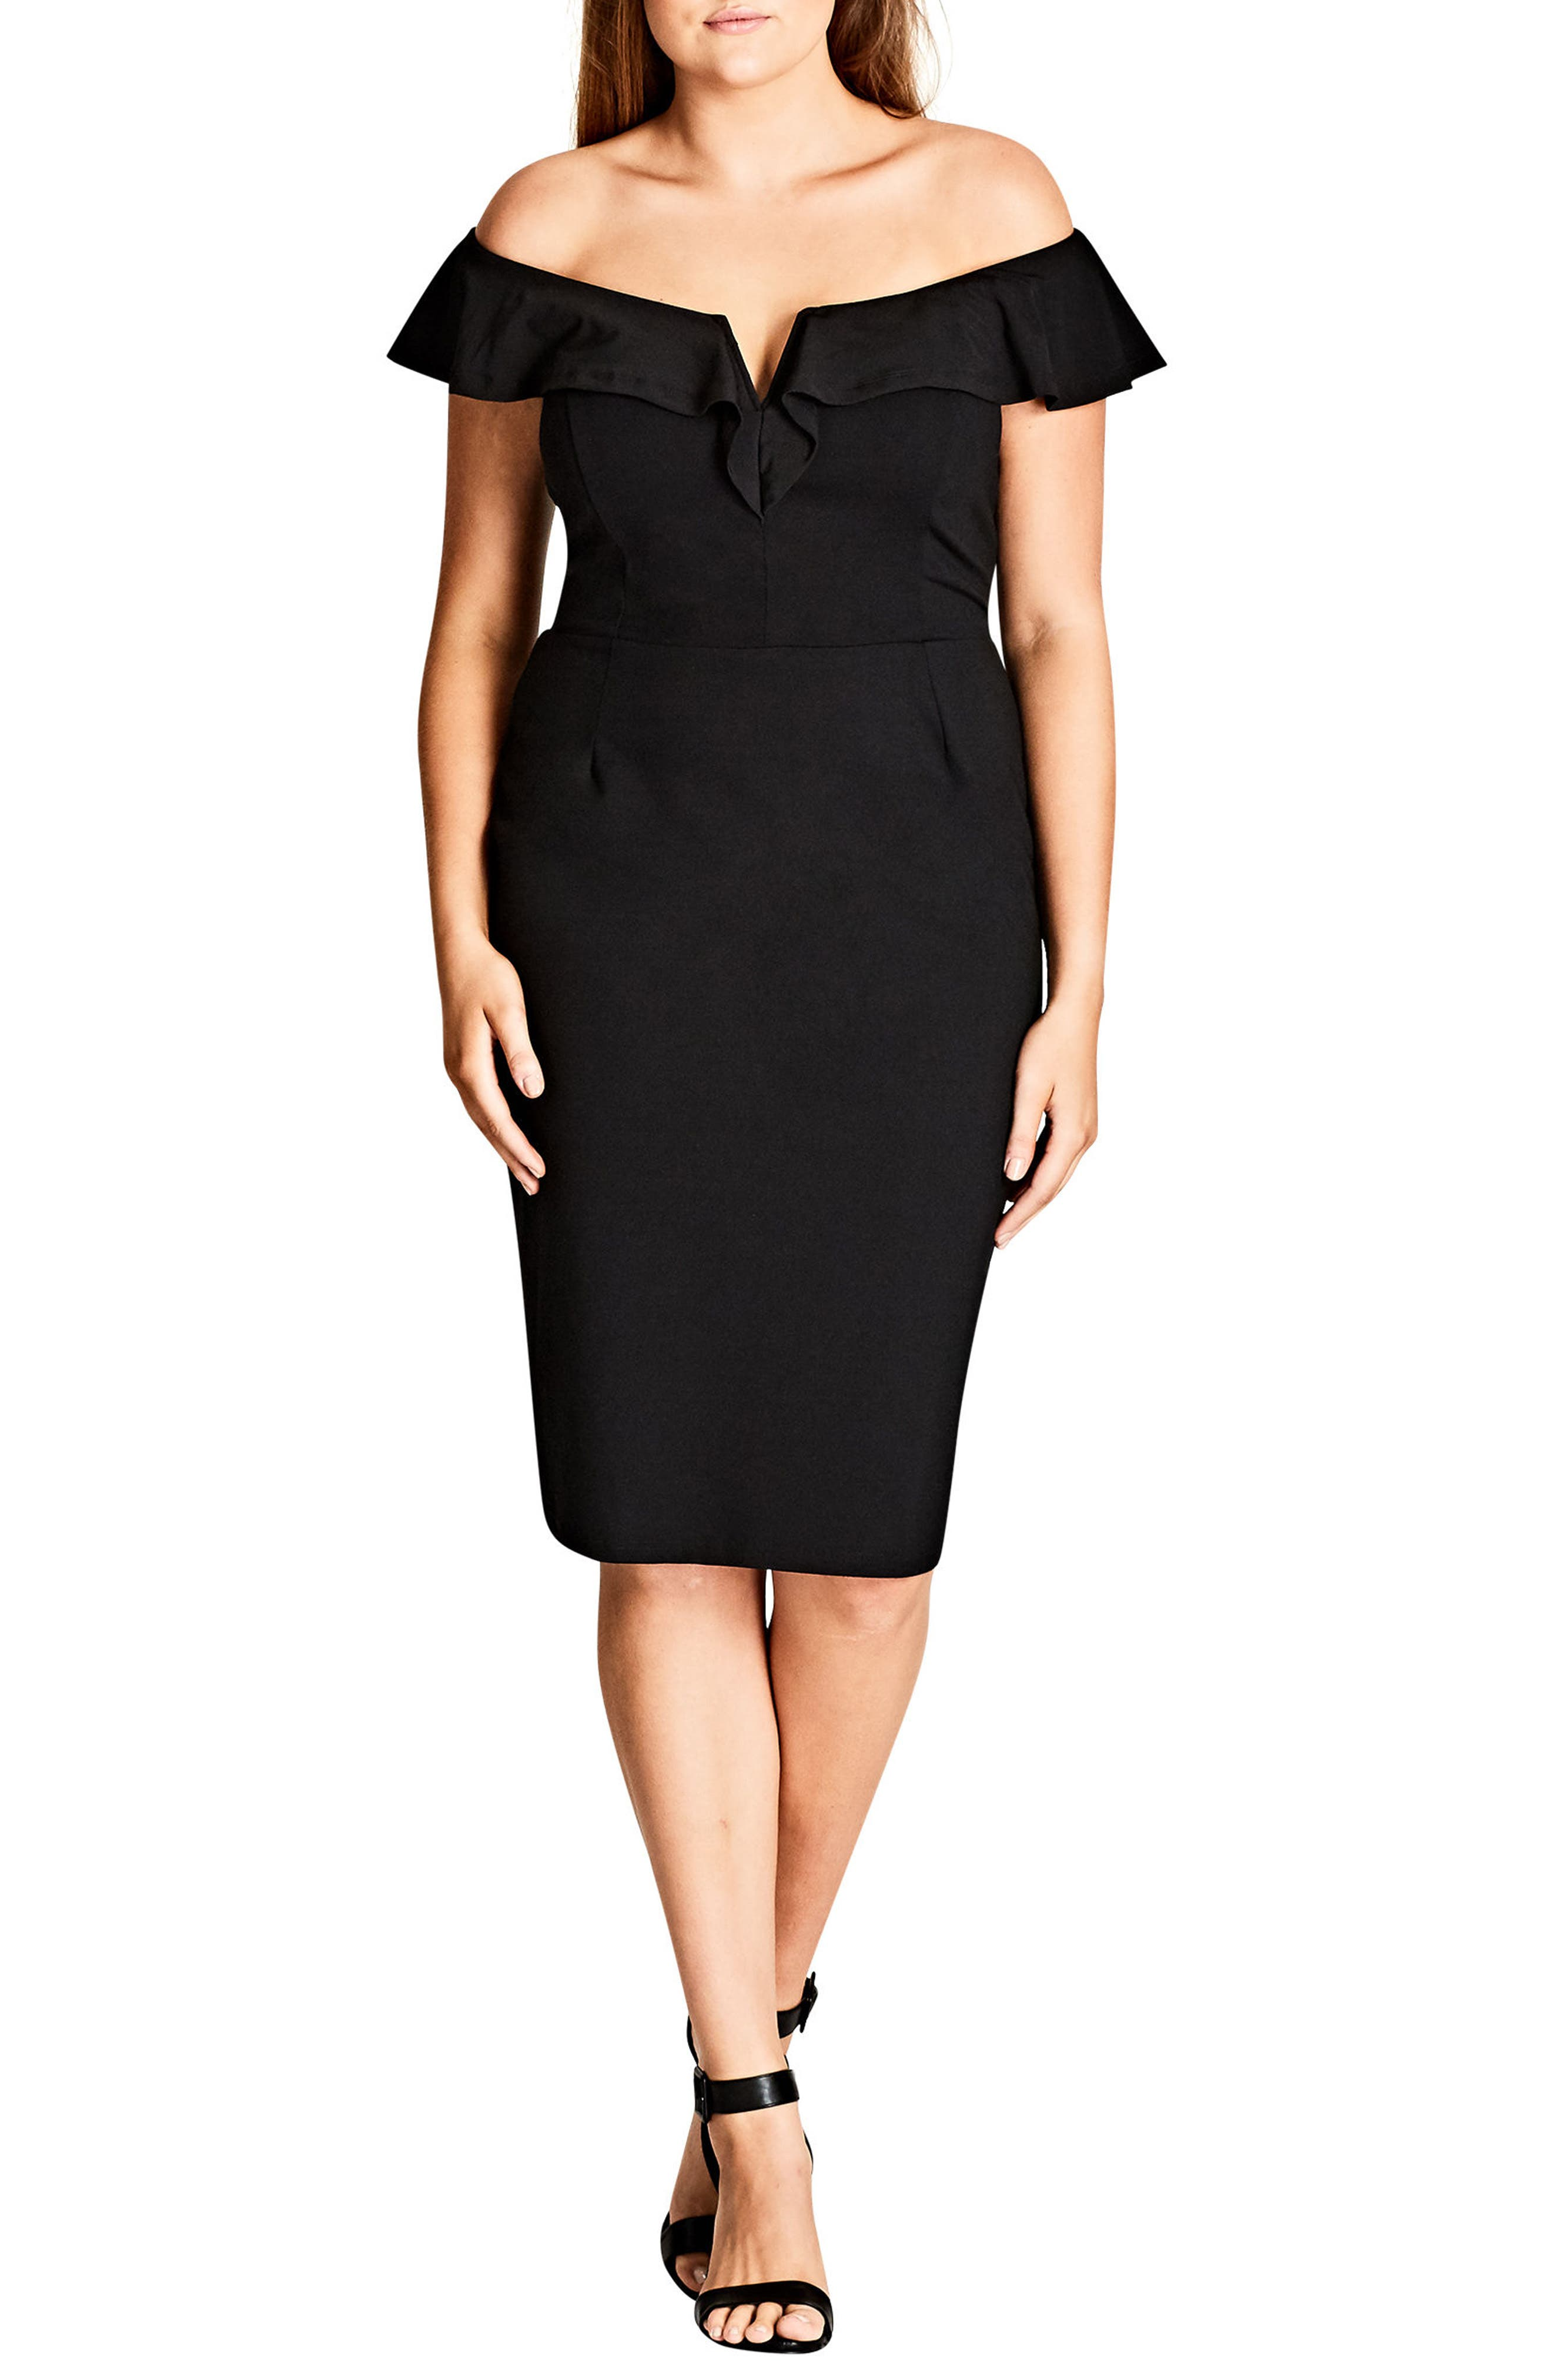 Main Image - City Chic Plunge Frill Sheath Dress (Plus Size)